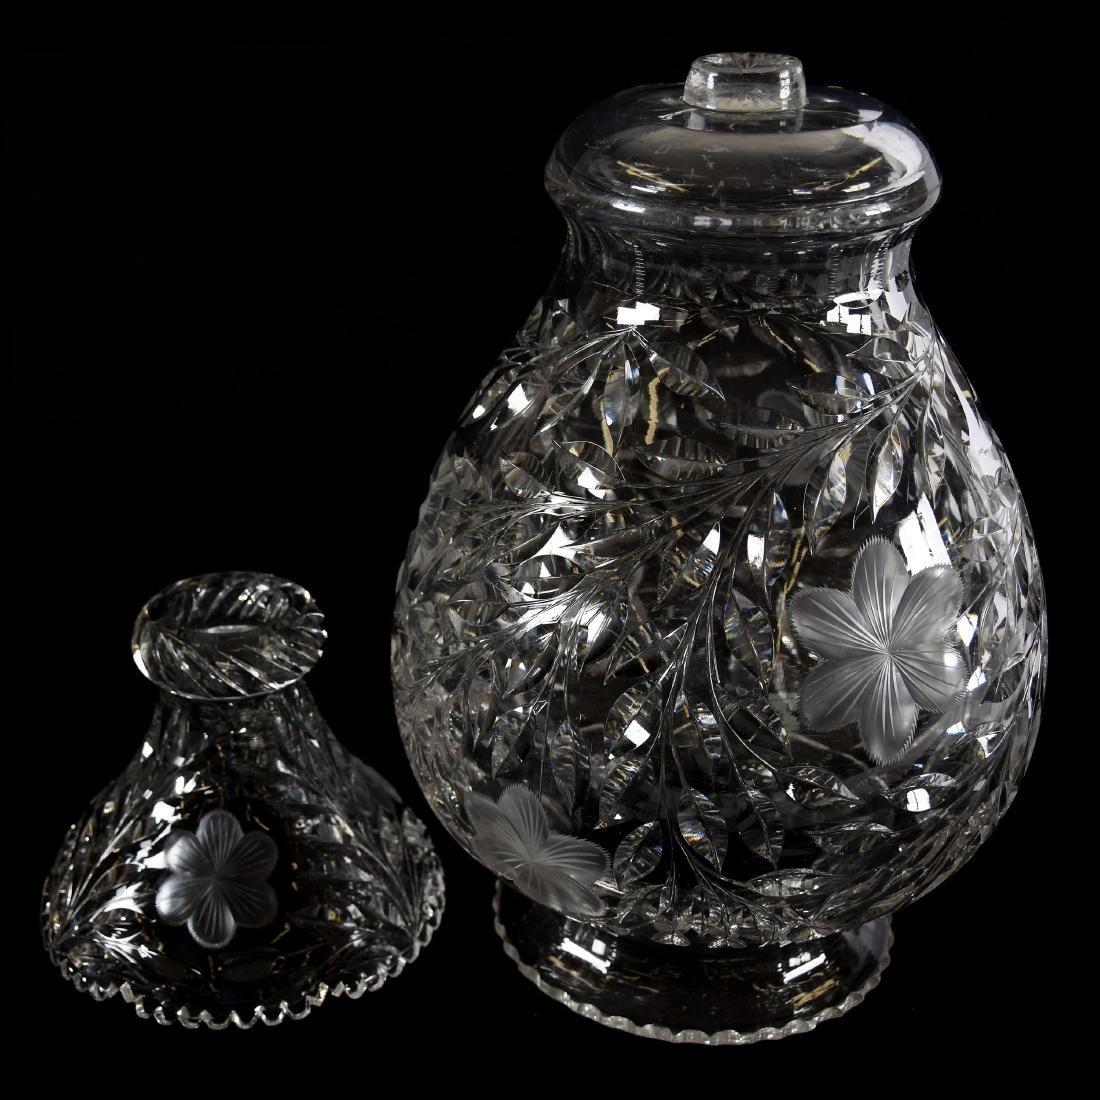 Two-Part Vase, Engraved Floral Motif - 2